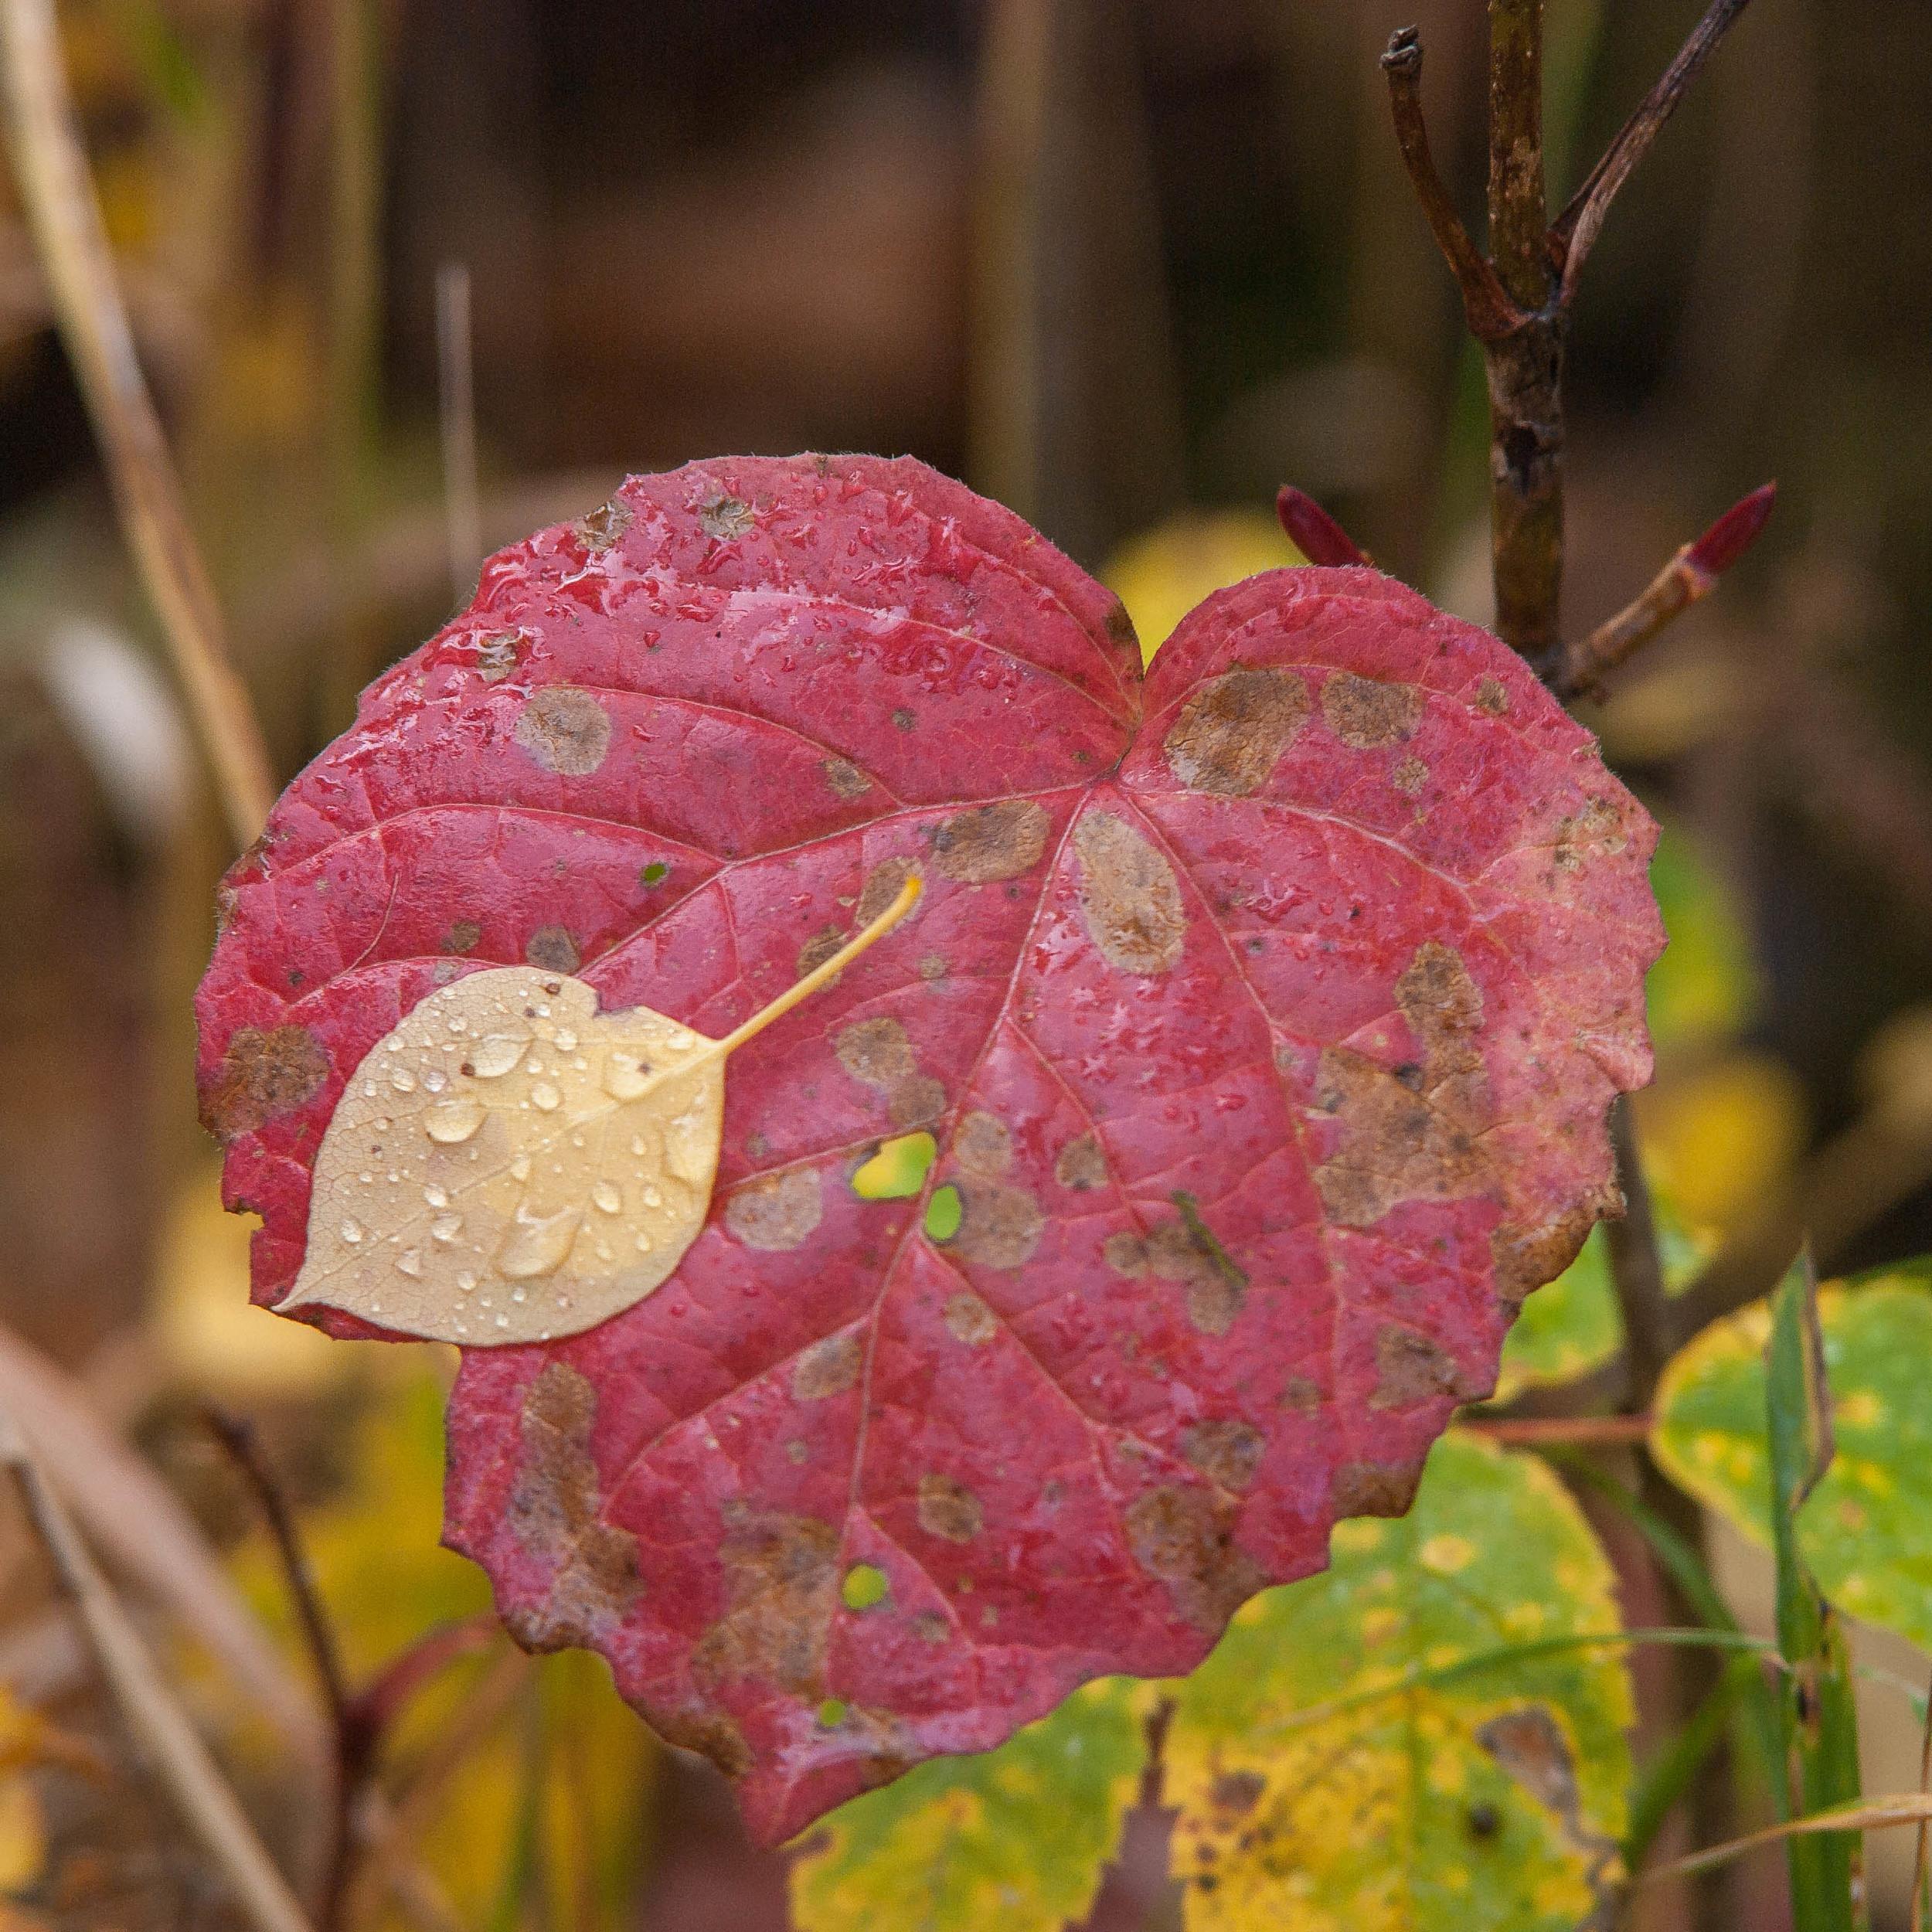 Autumn leaves by Steve Ricketts